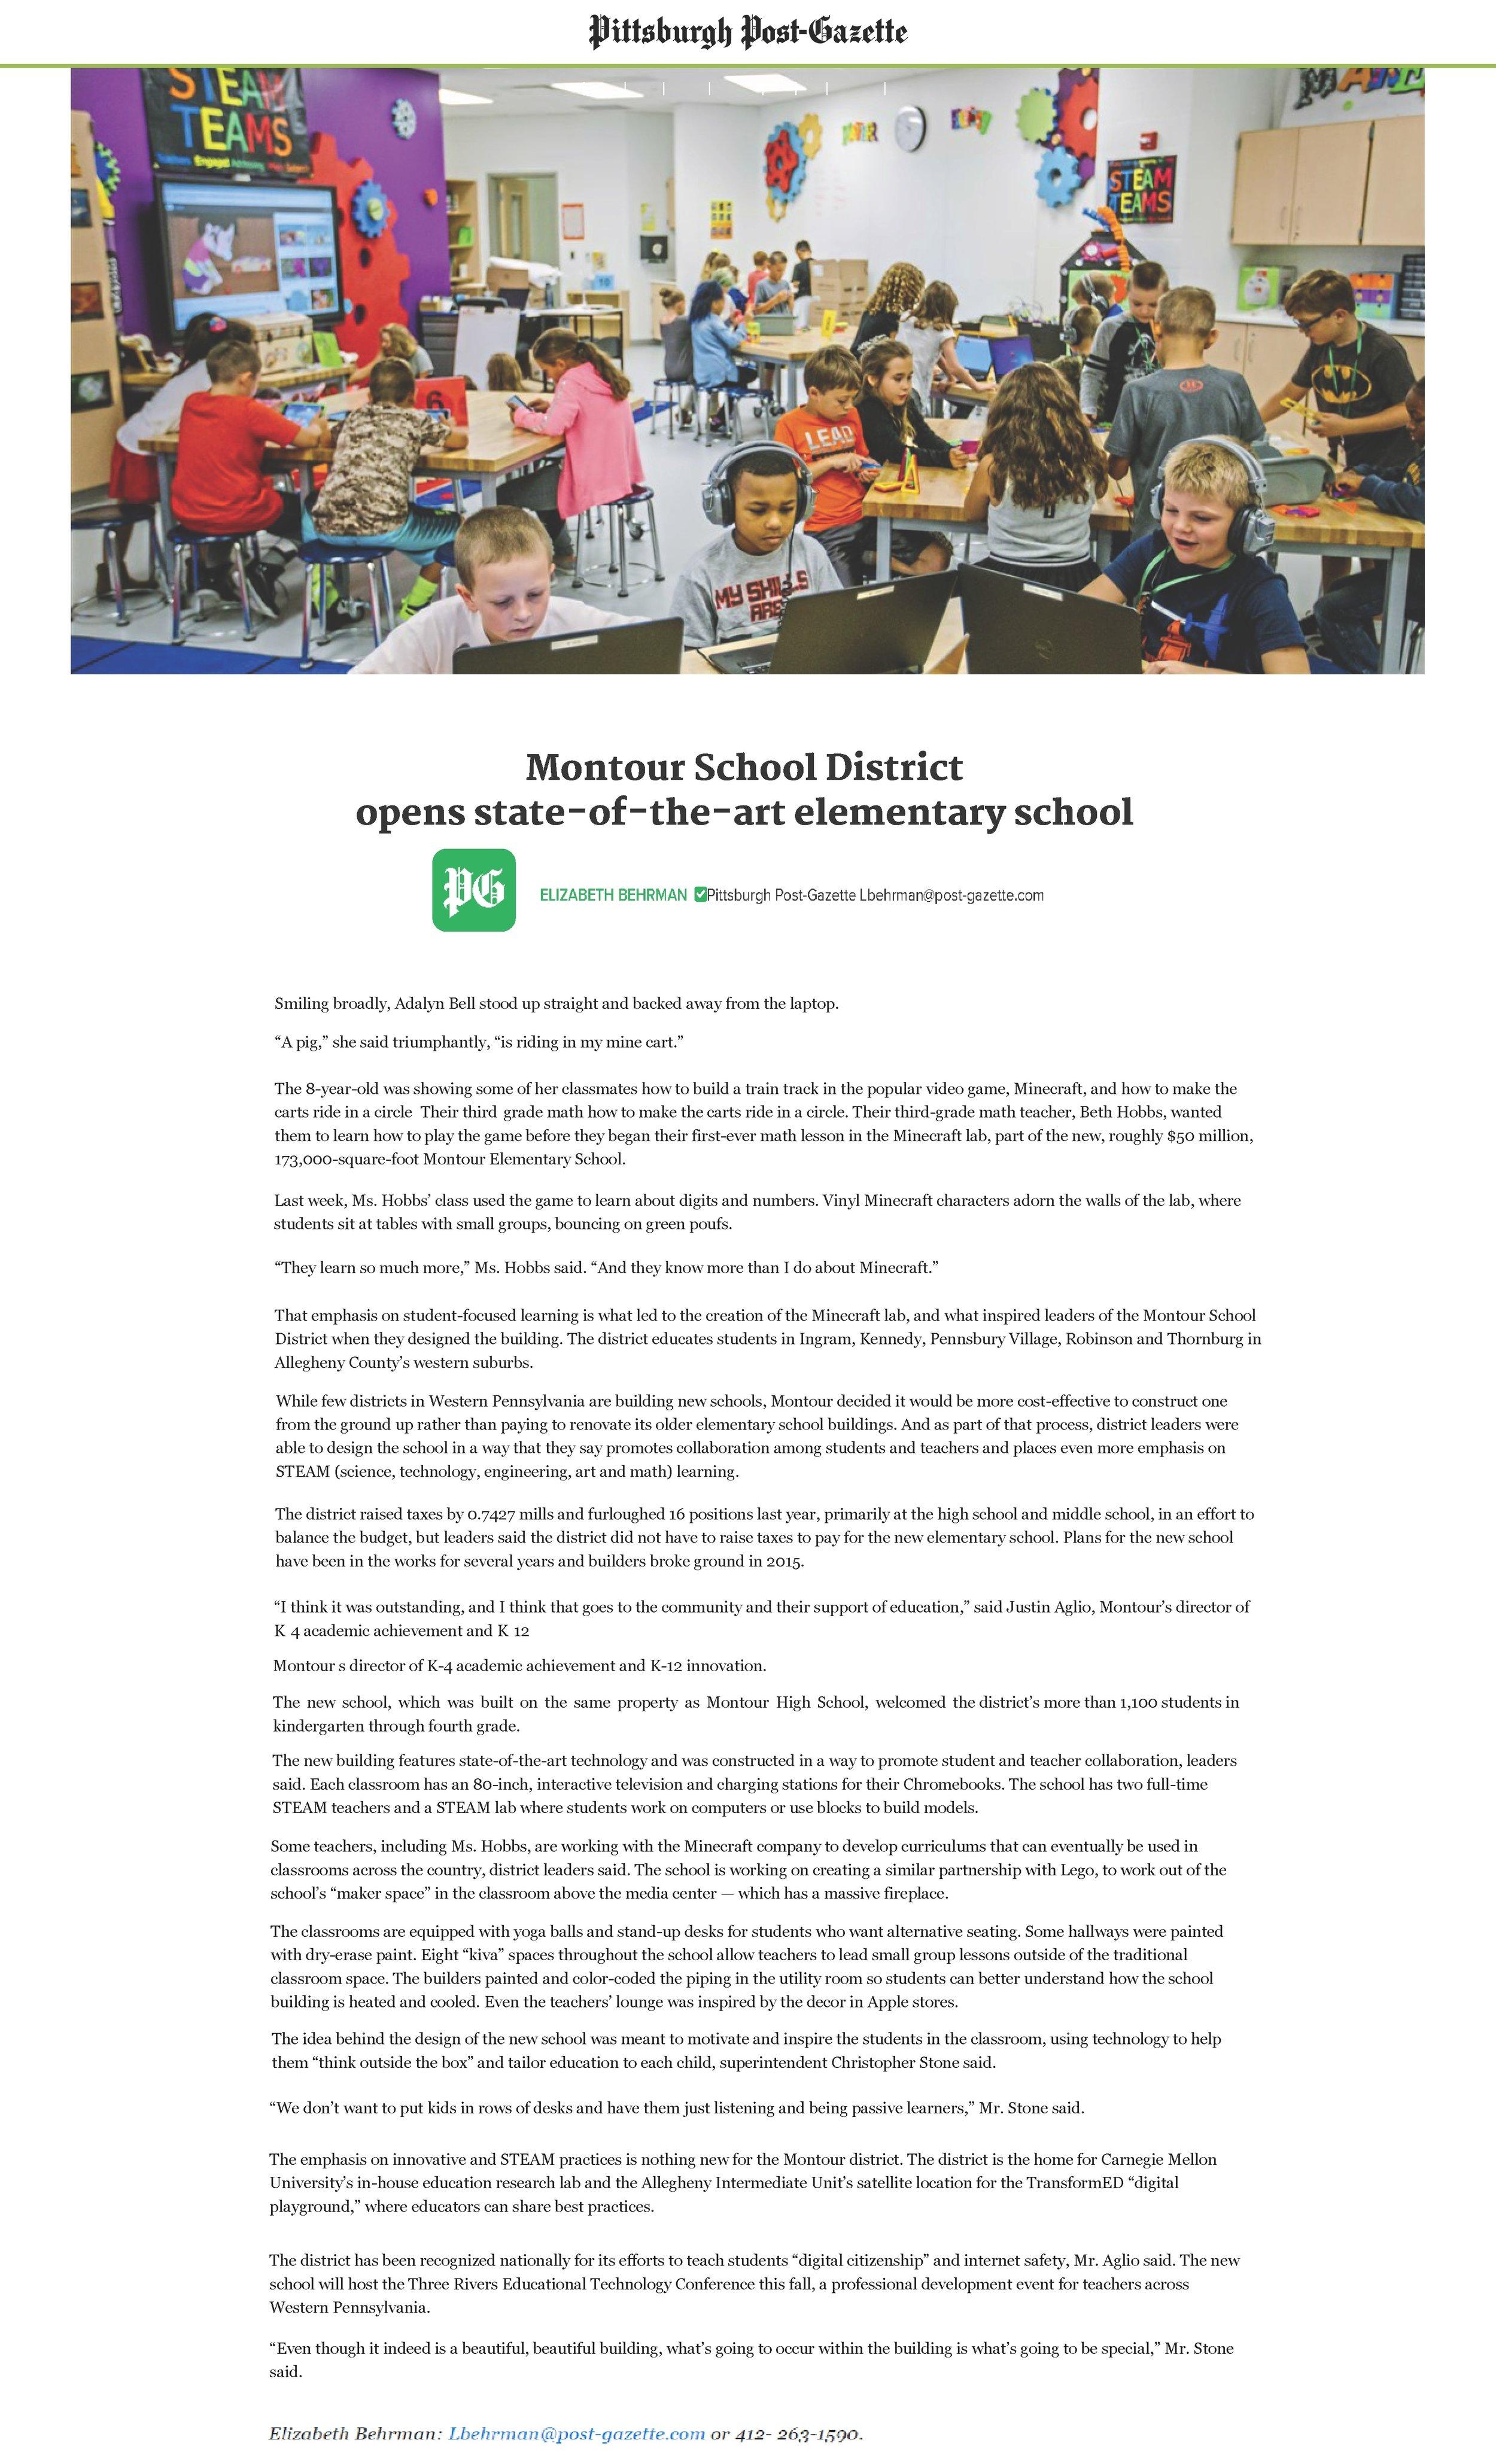 Montour School District PPG.jpg